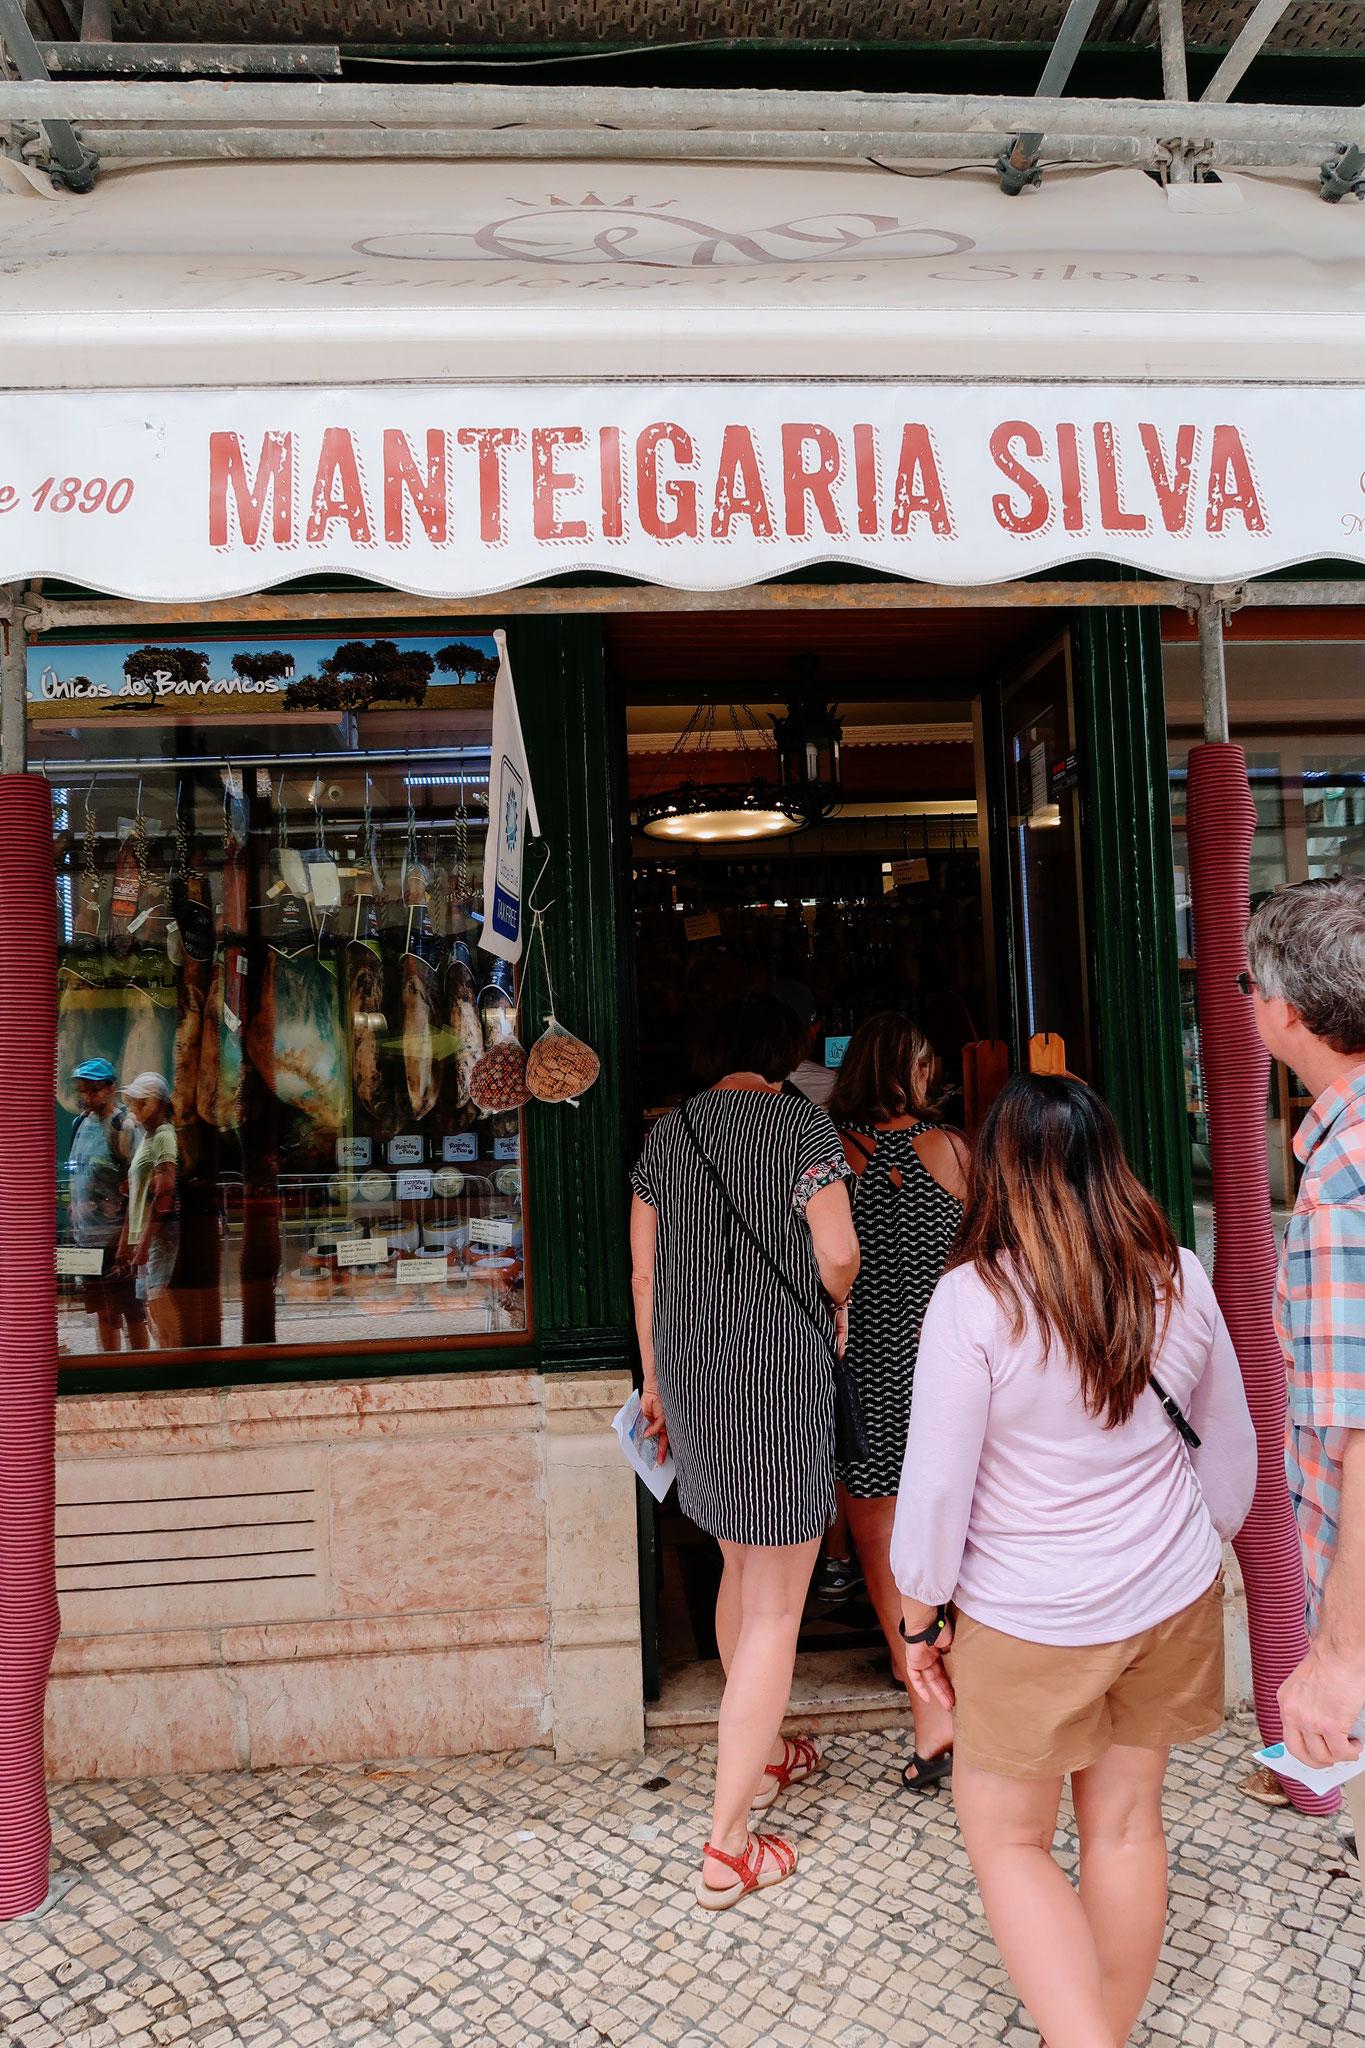 Delikatessenladen Manteigaria Silva